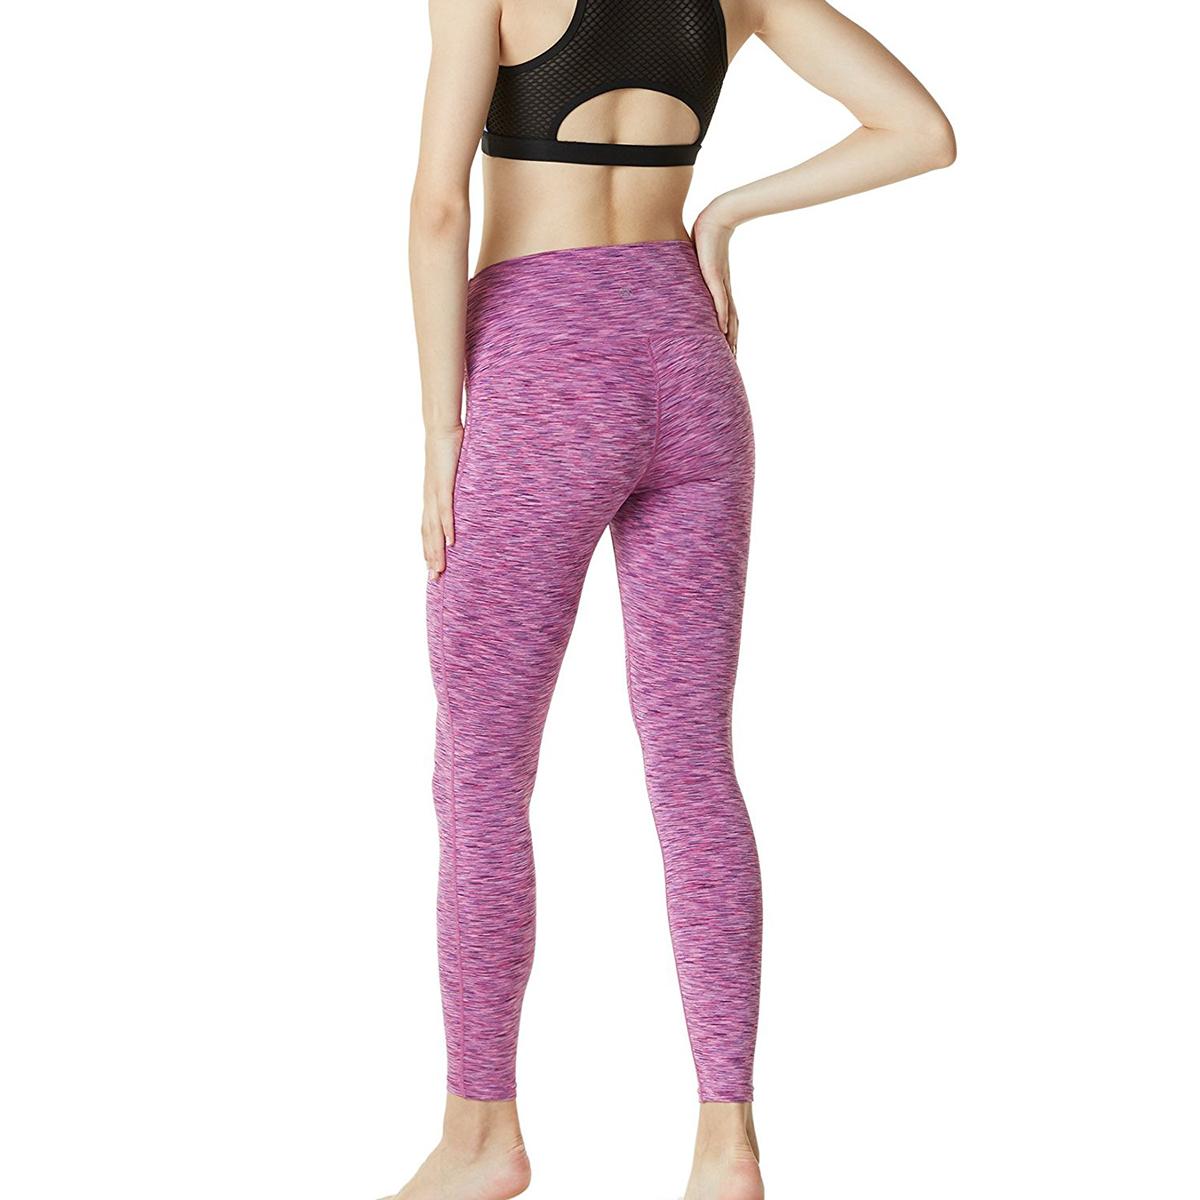 thumbnail 94 - TSLA Tesla FYP42 Women's High-Waisted Ultra-Stretch Tummy Control Yoga Pants